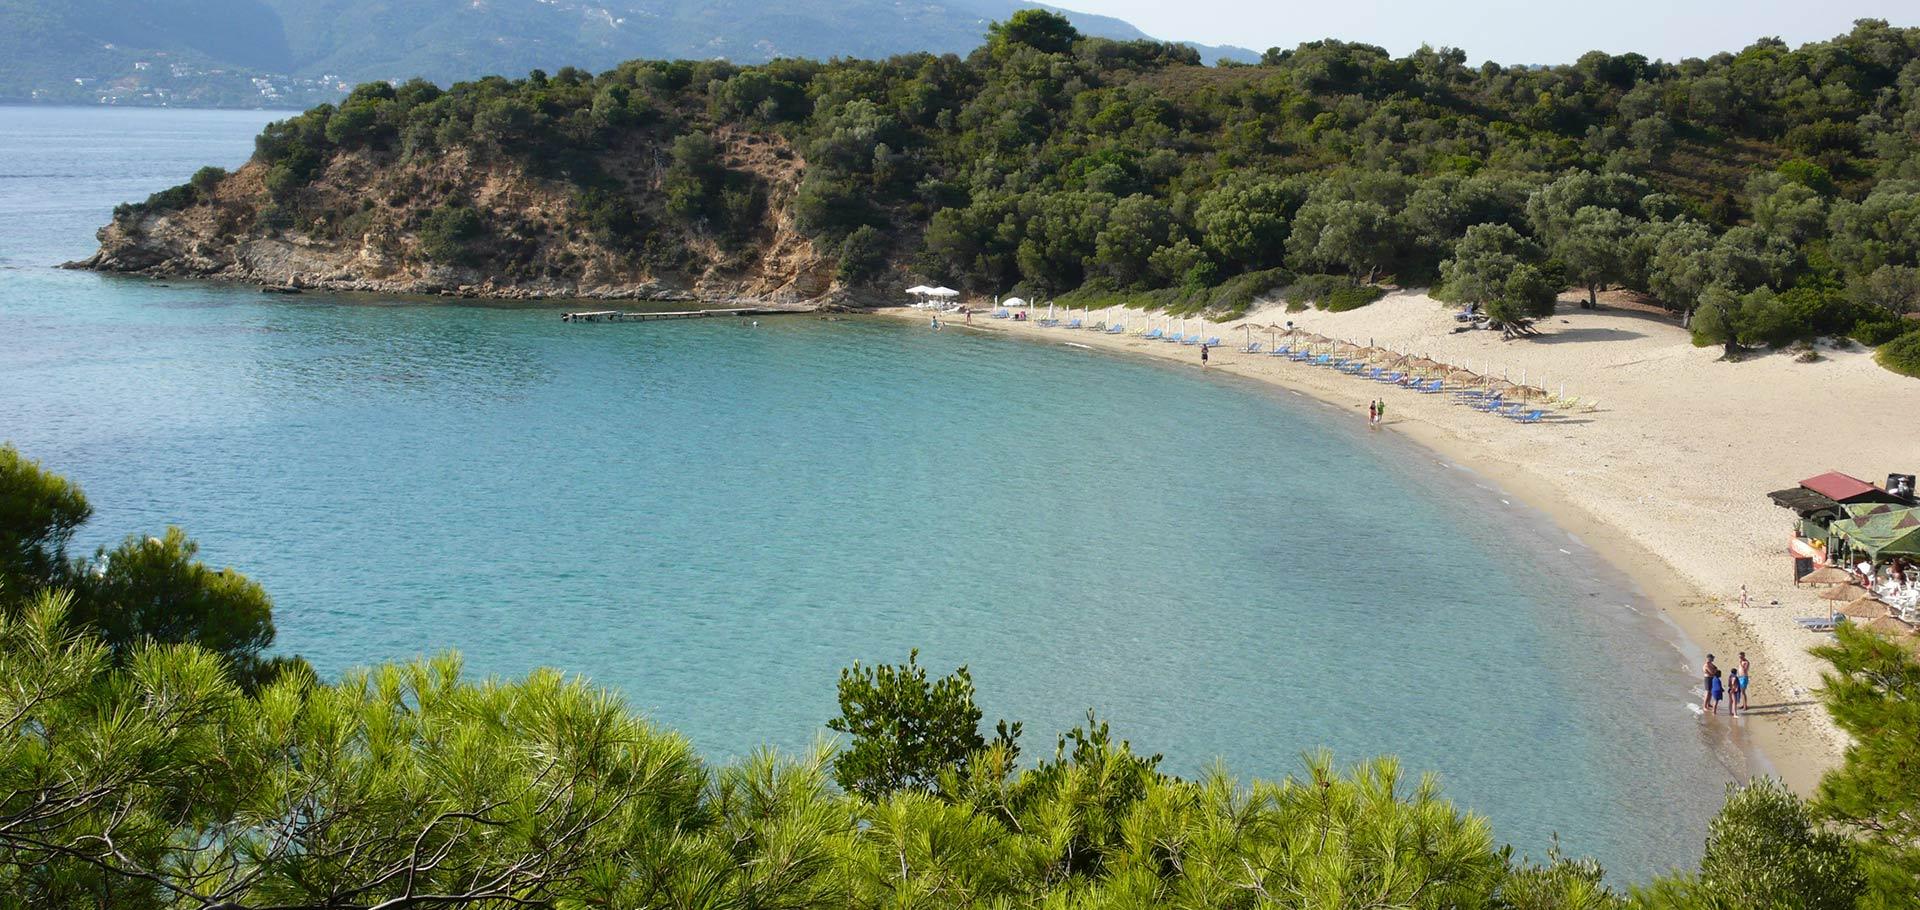 Rent a Motor Boat and explore Tsougria beach